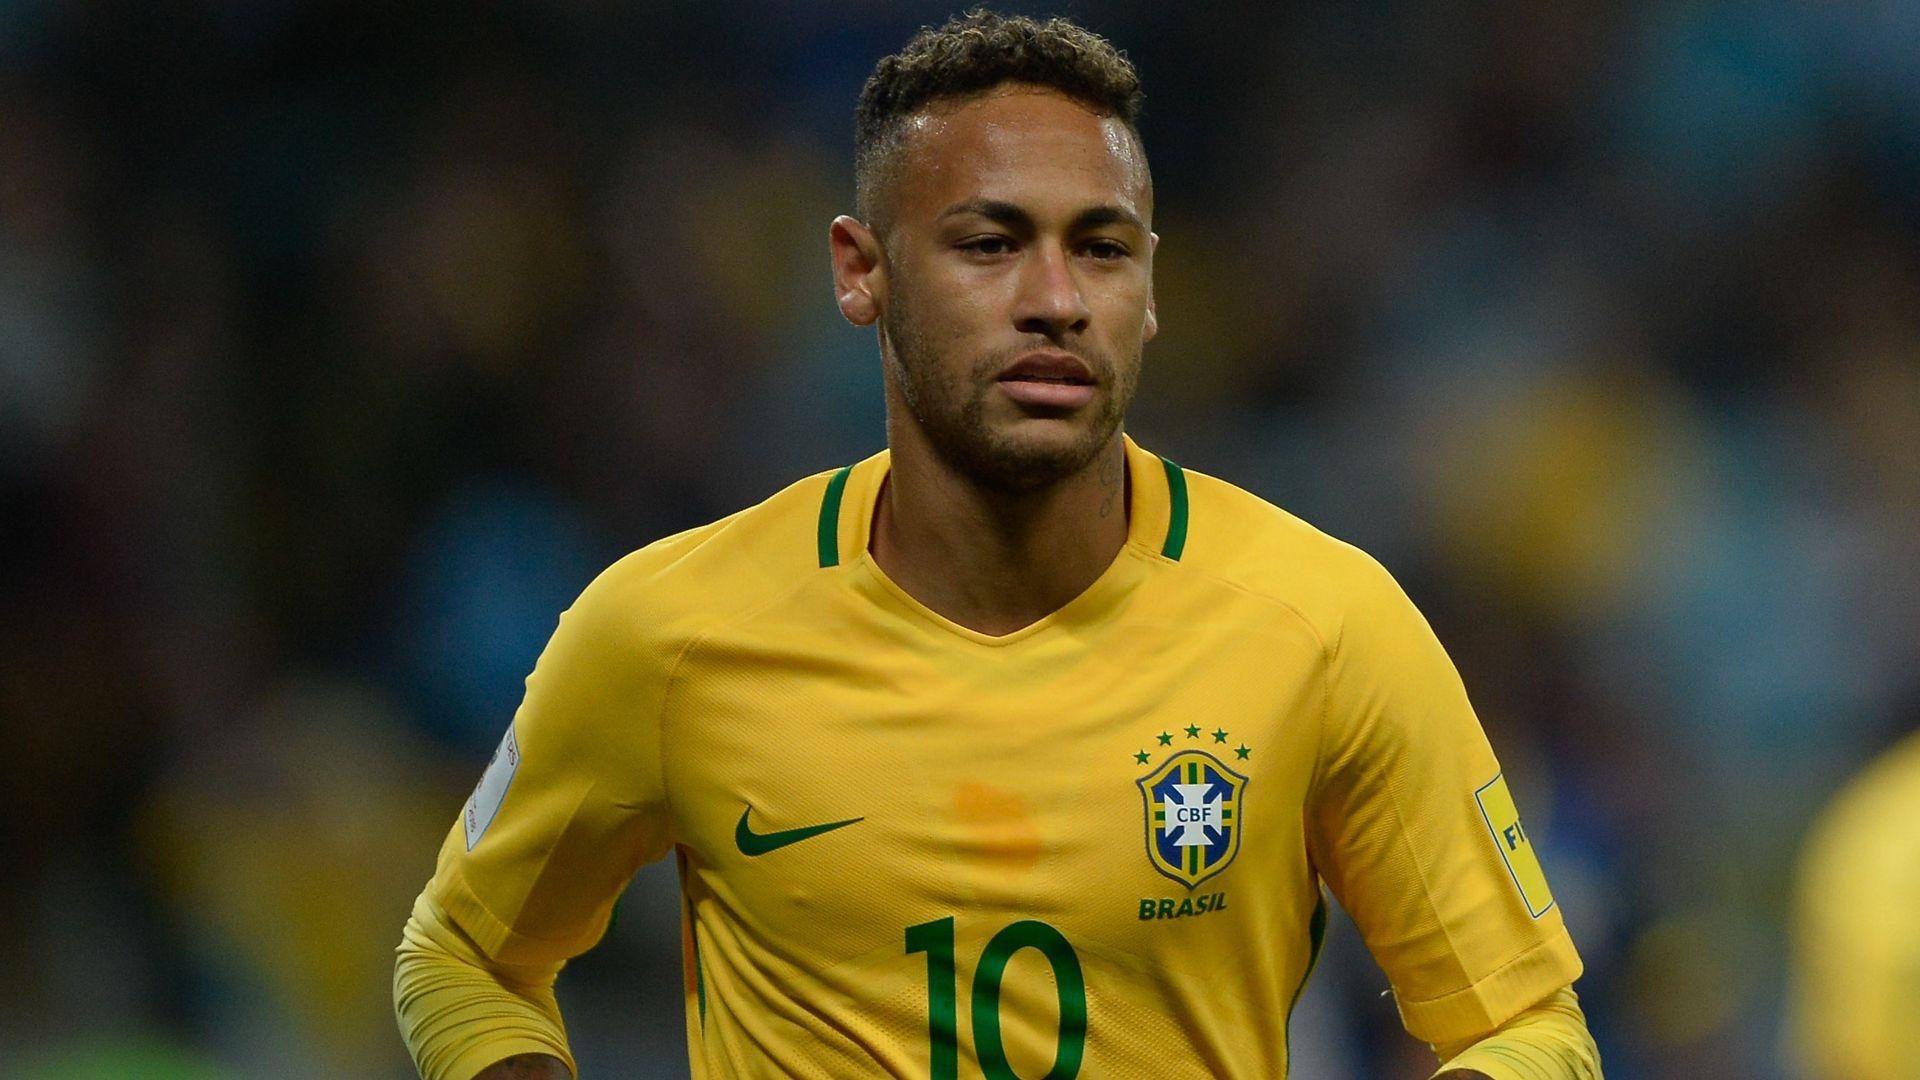 Neymar Brazil Ecuador Eliminatorias 2018 31082017